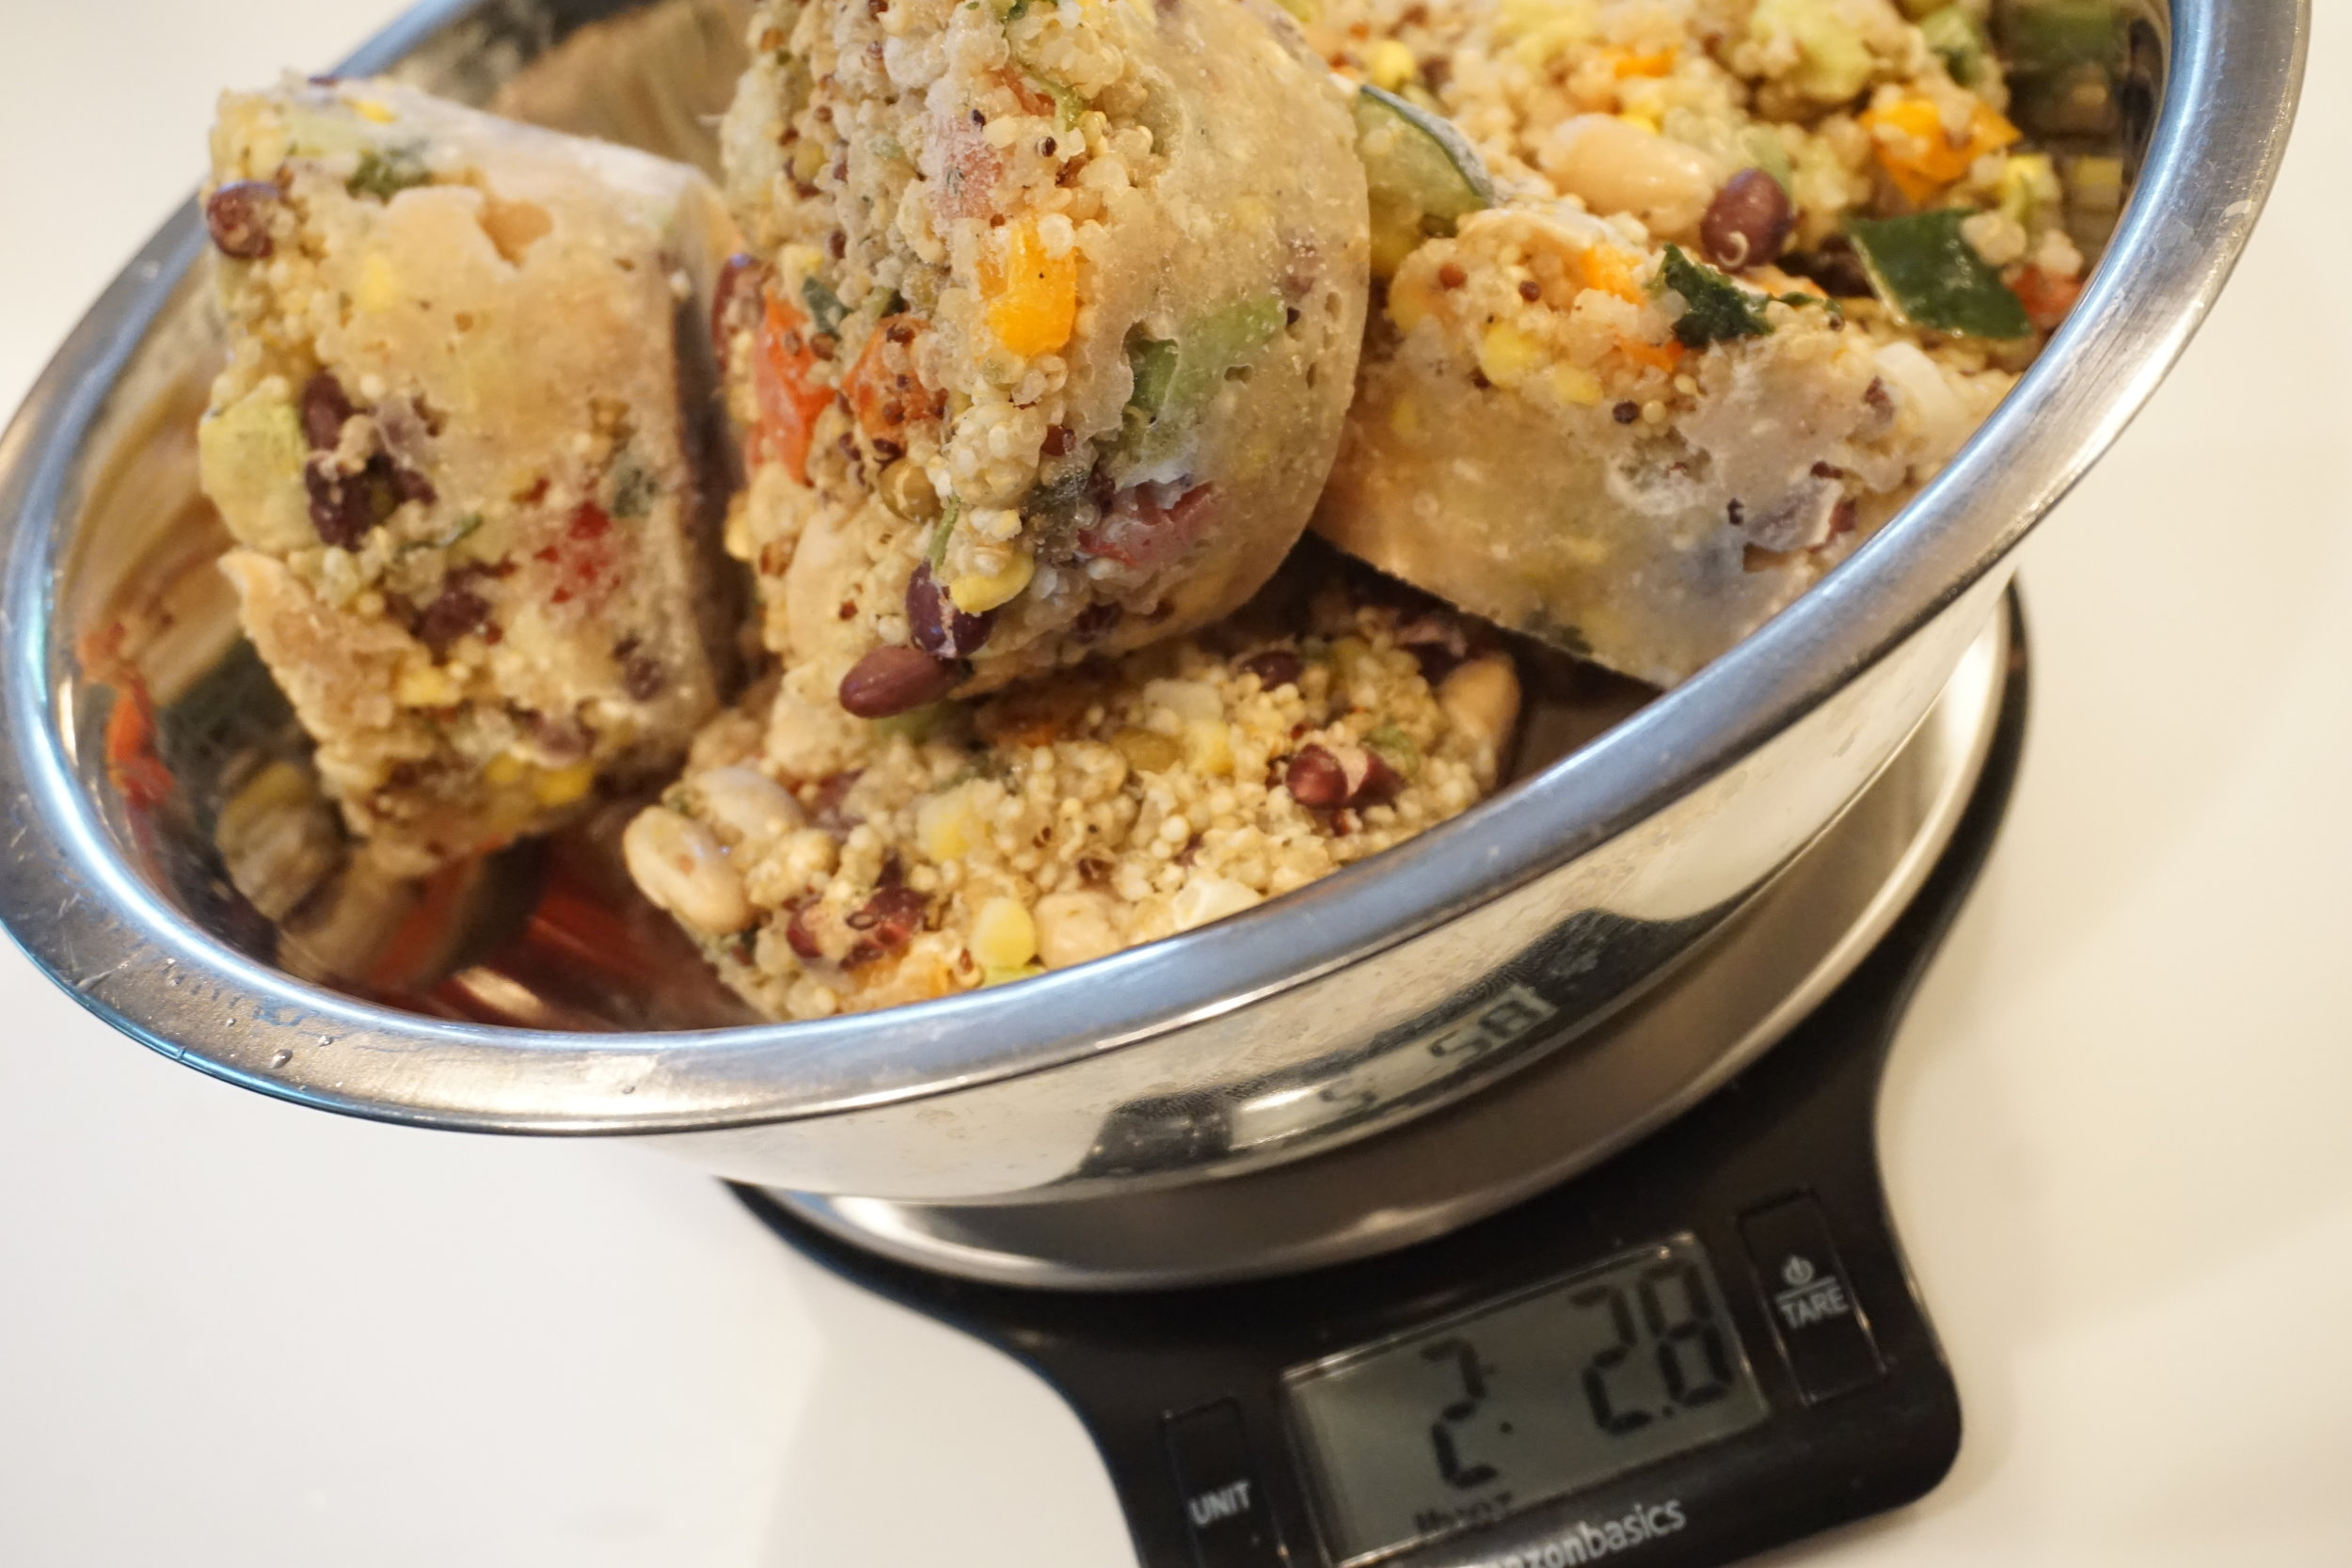 Weighing frozen pucks of quinoa salad